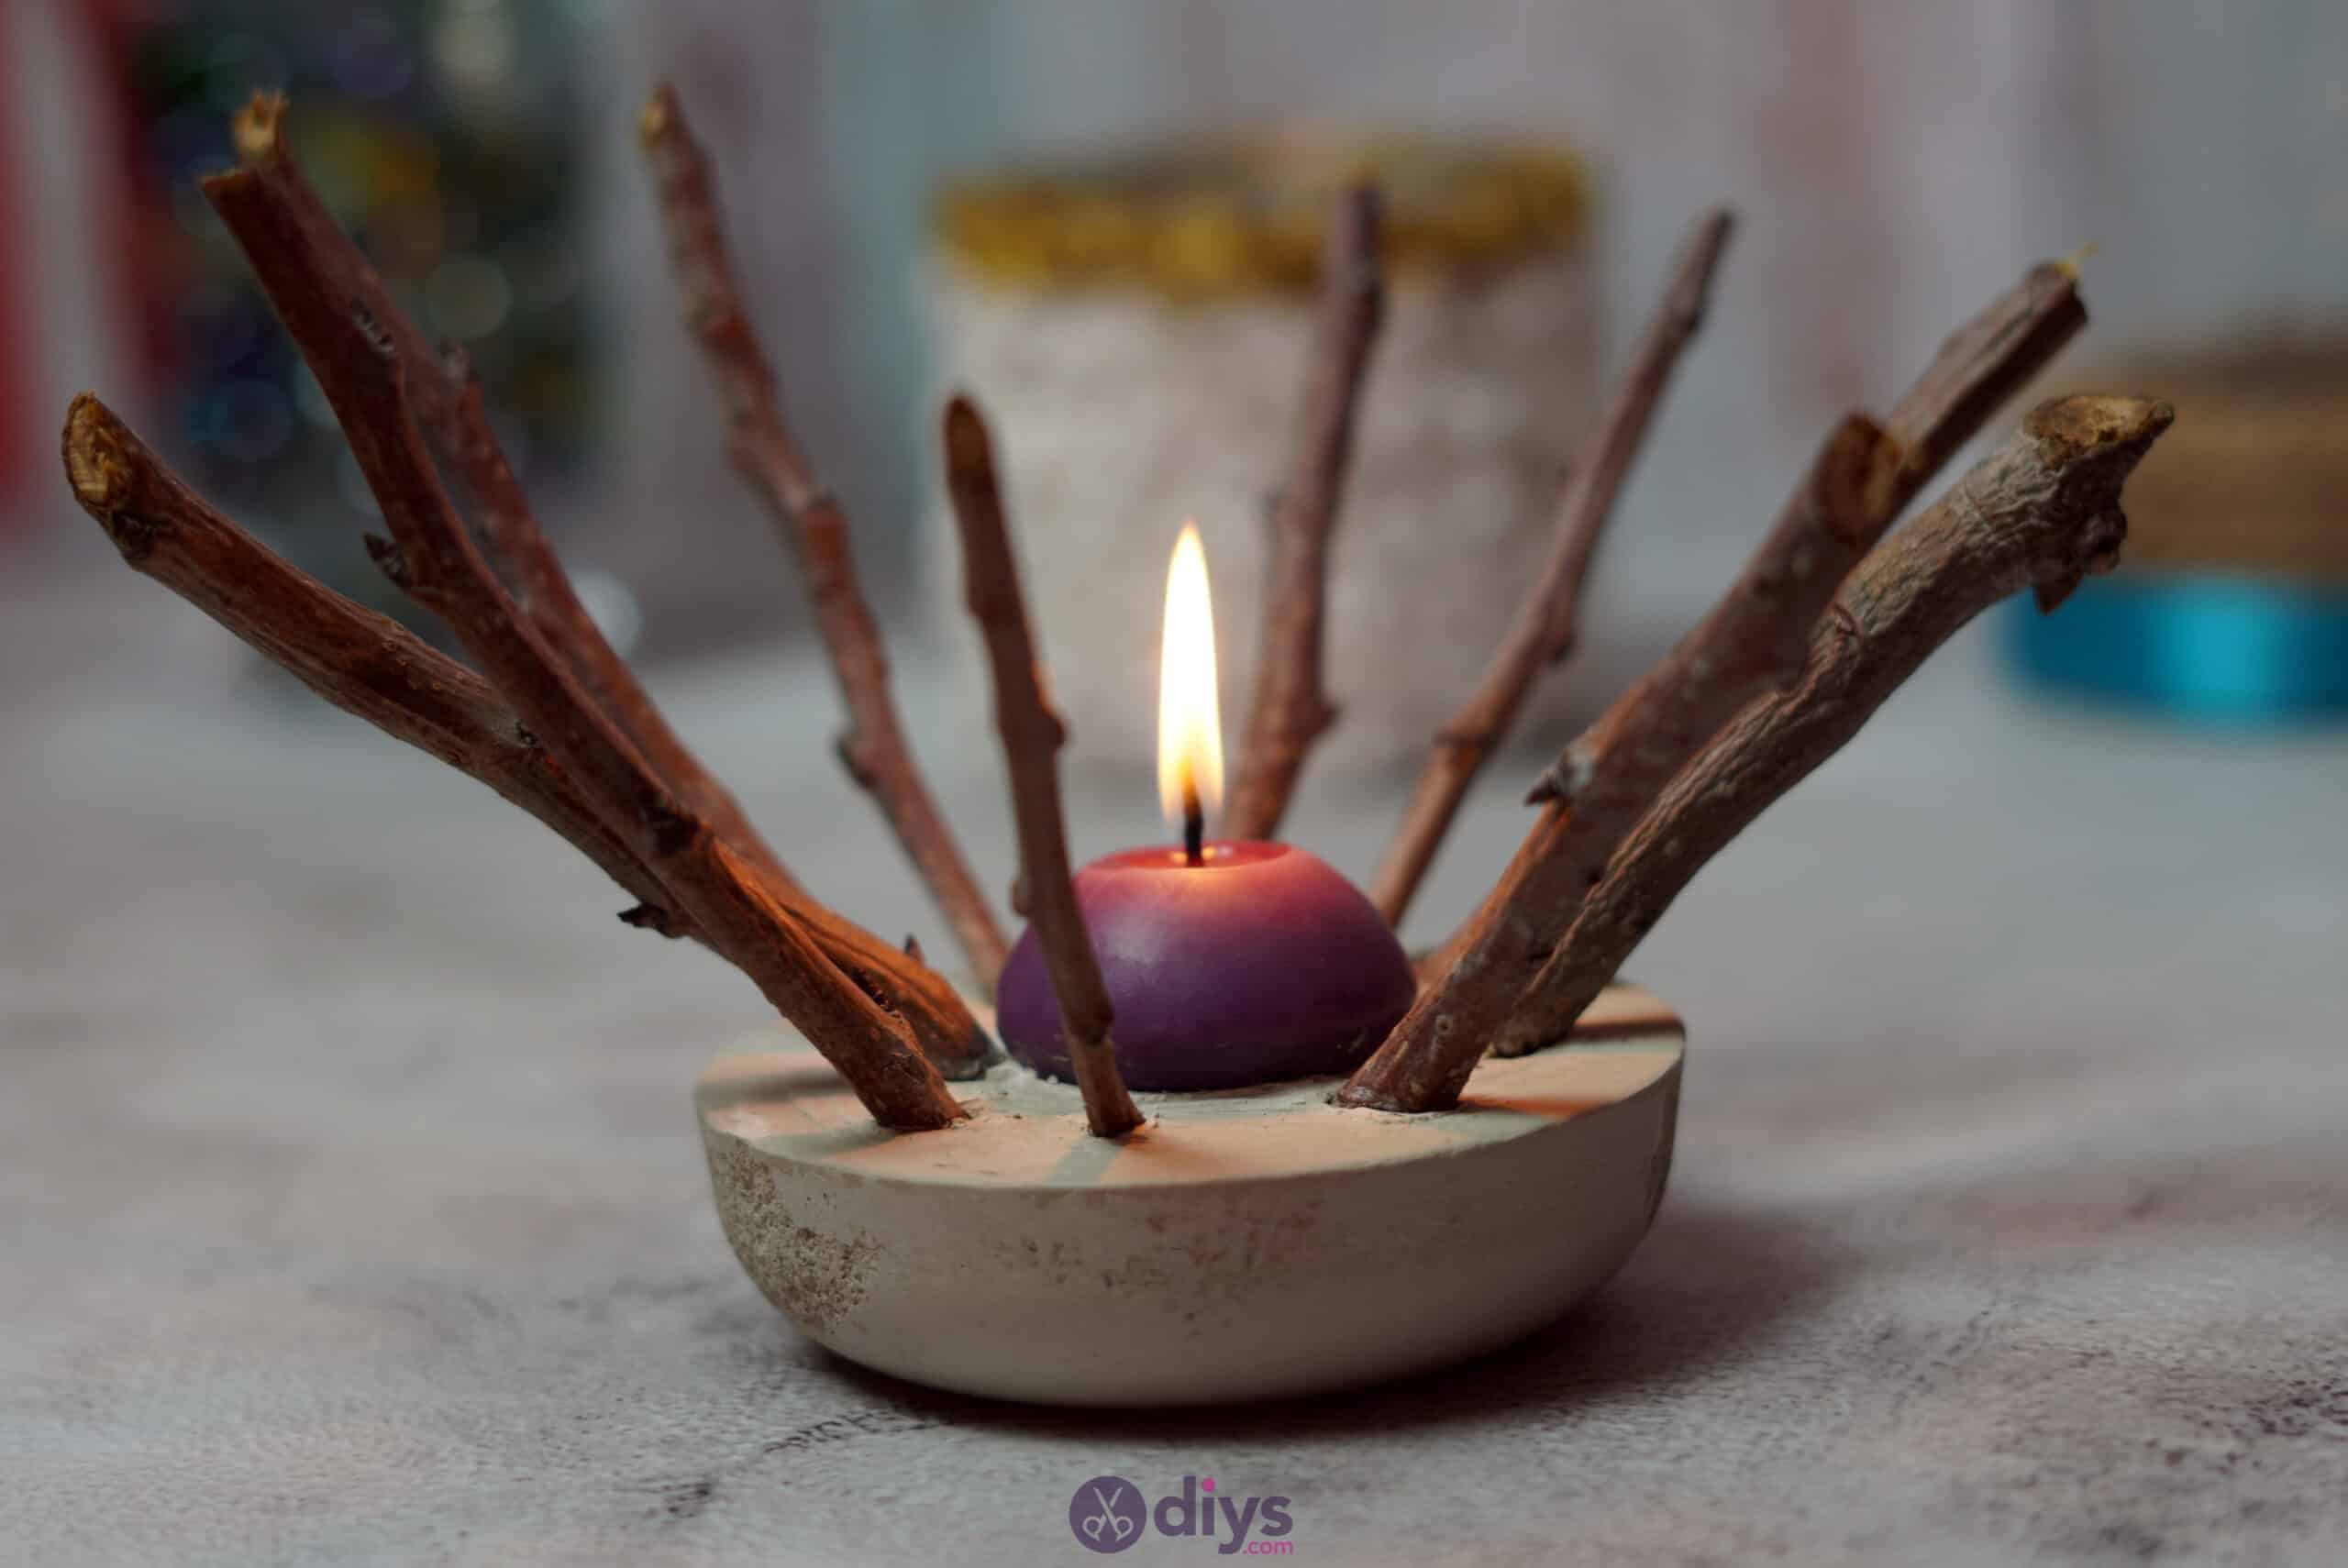 Diy wood concrete candle art rustic